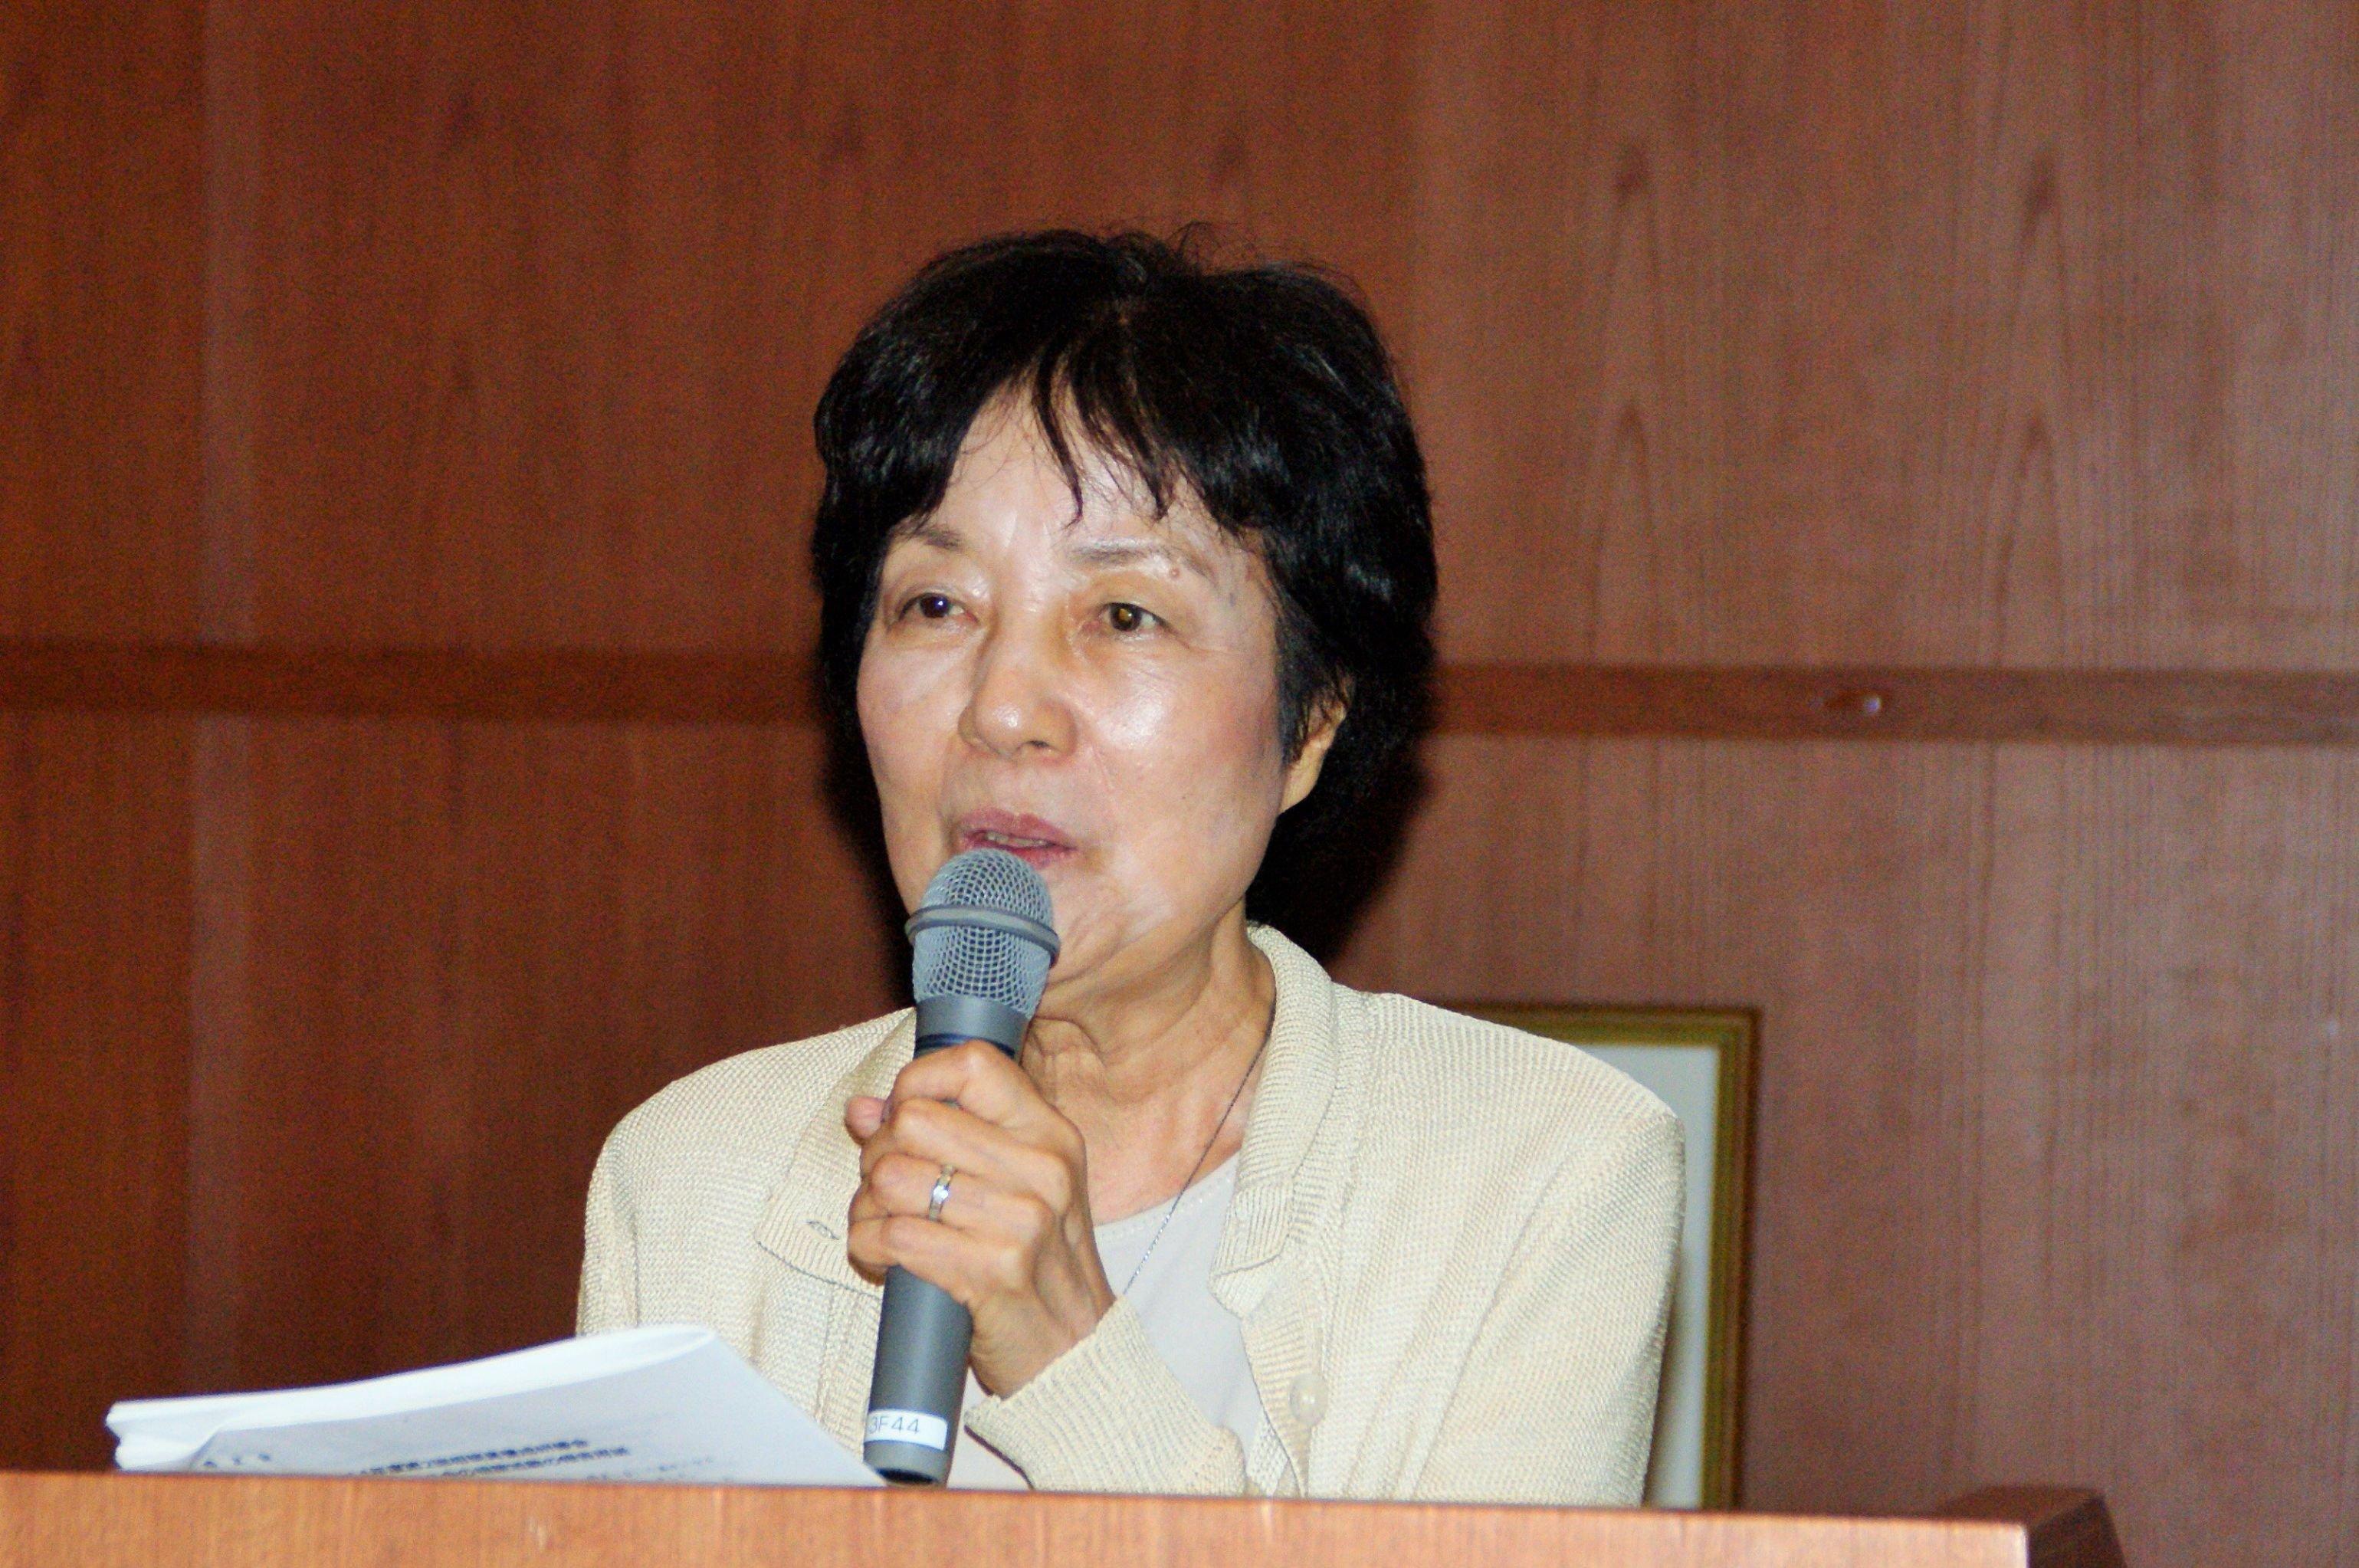 Reiko Yamada